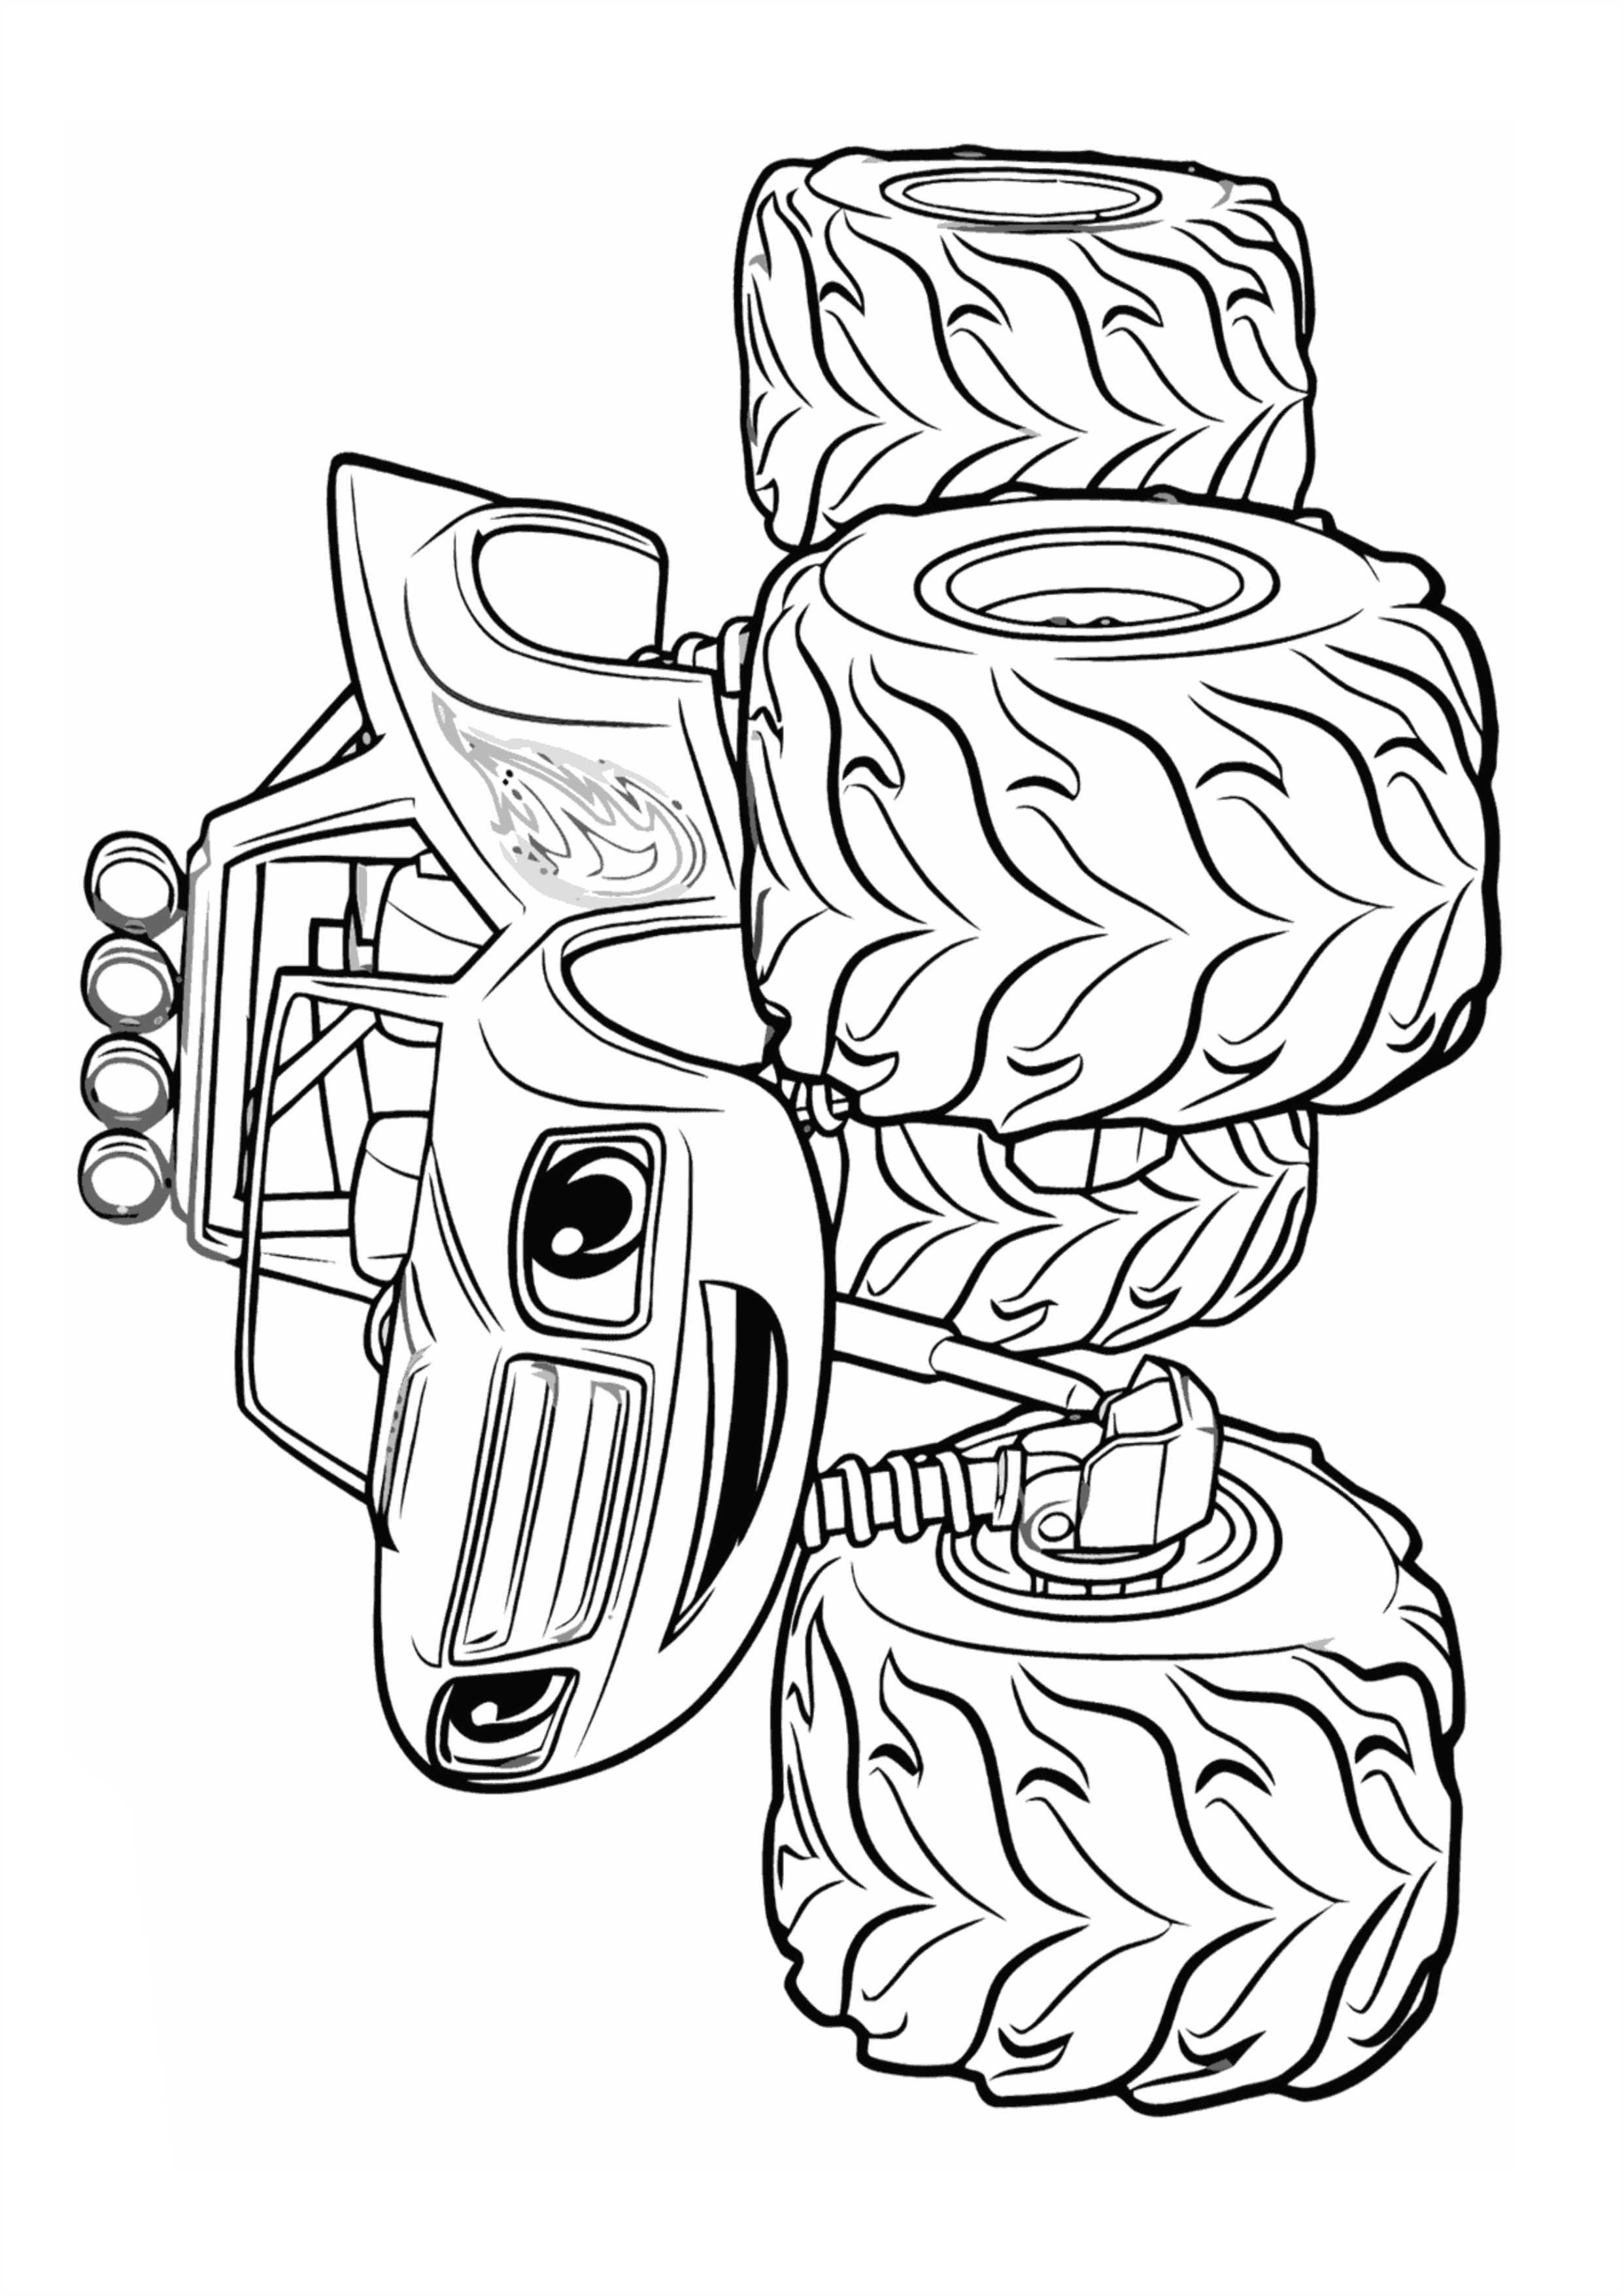 Раскраска Вспыш - Раскраски А4 формата для распечатки